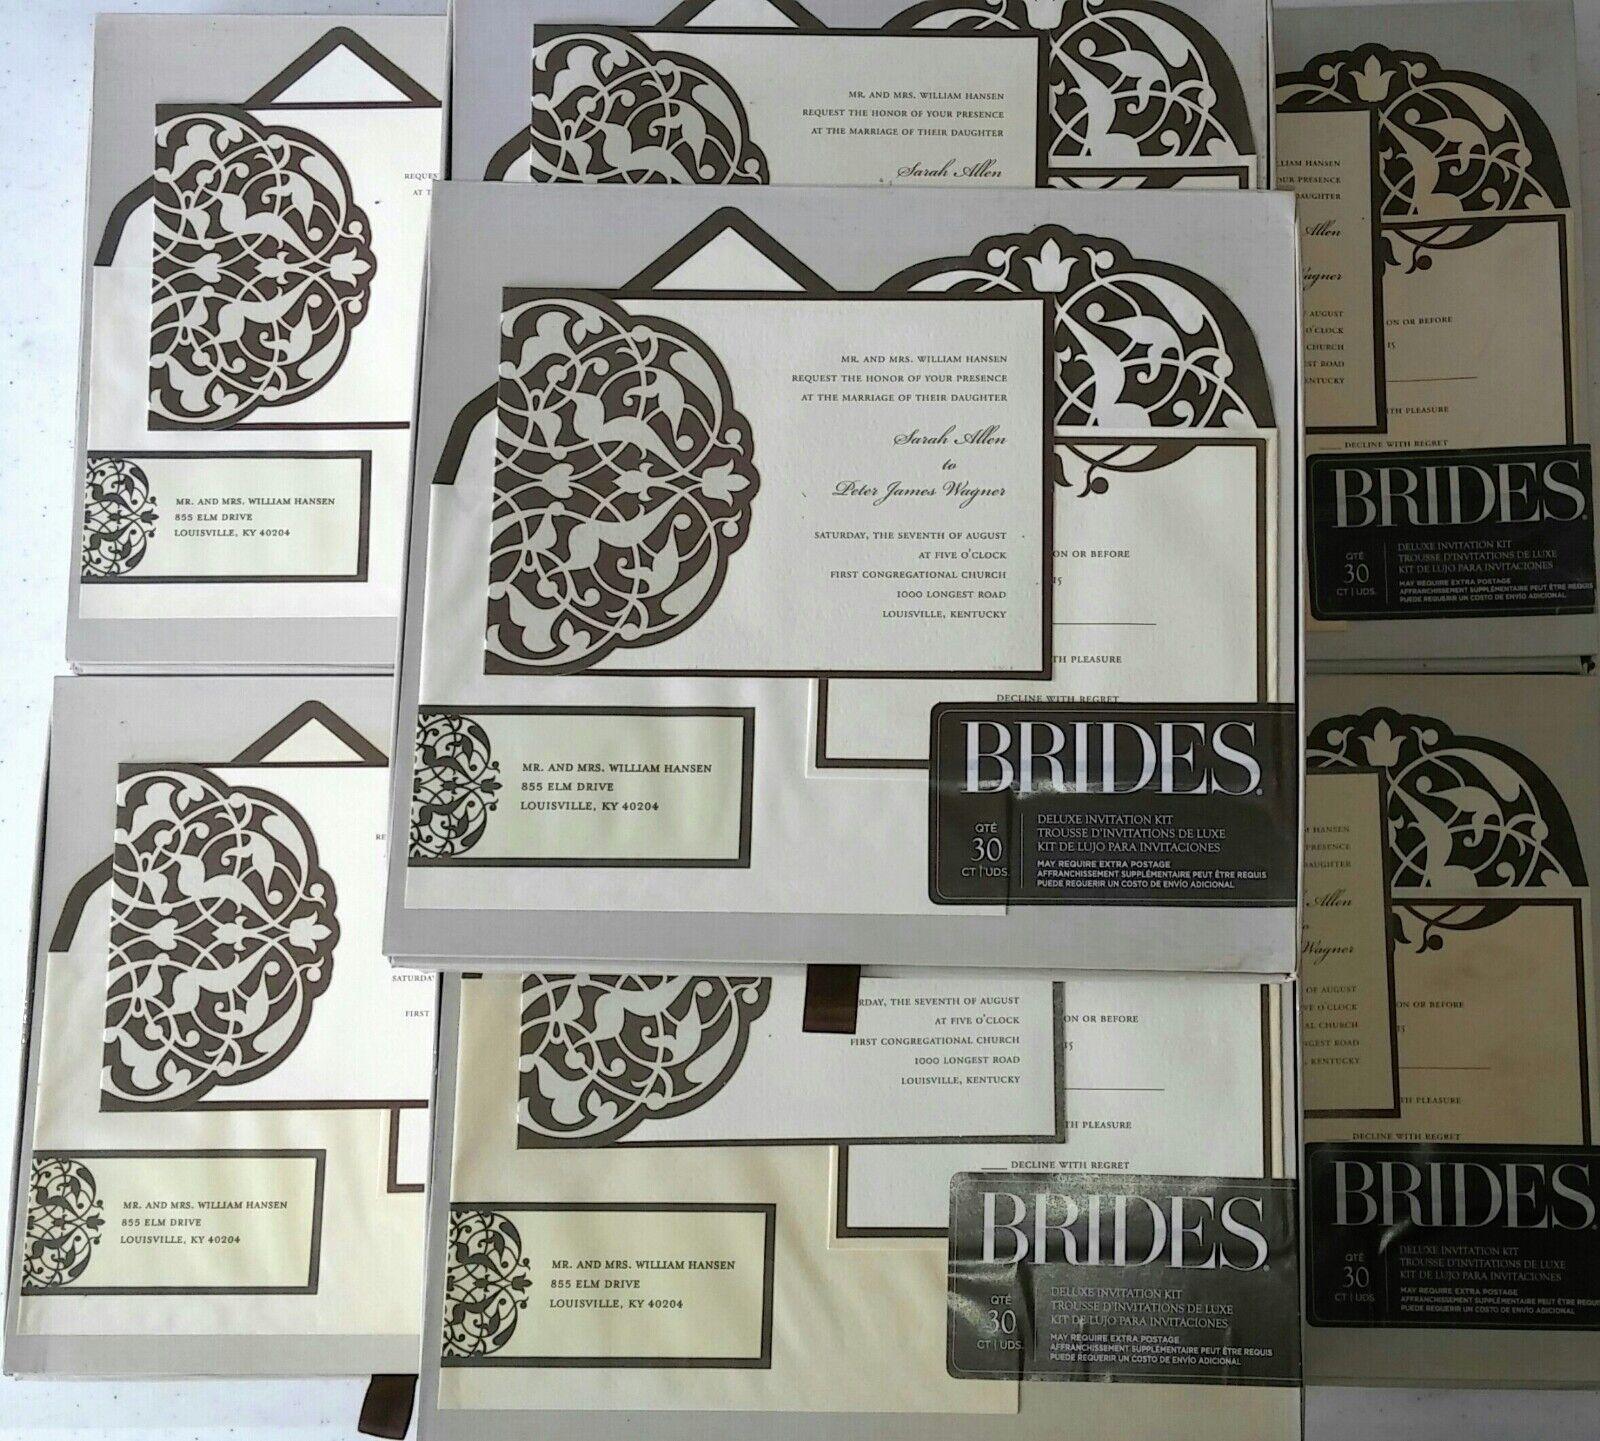 New BRIDES Deluxe Invitation Kit marron Ivy Flourish 150 Pieces wedding.. 5 Boxes